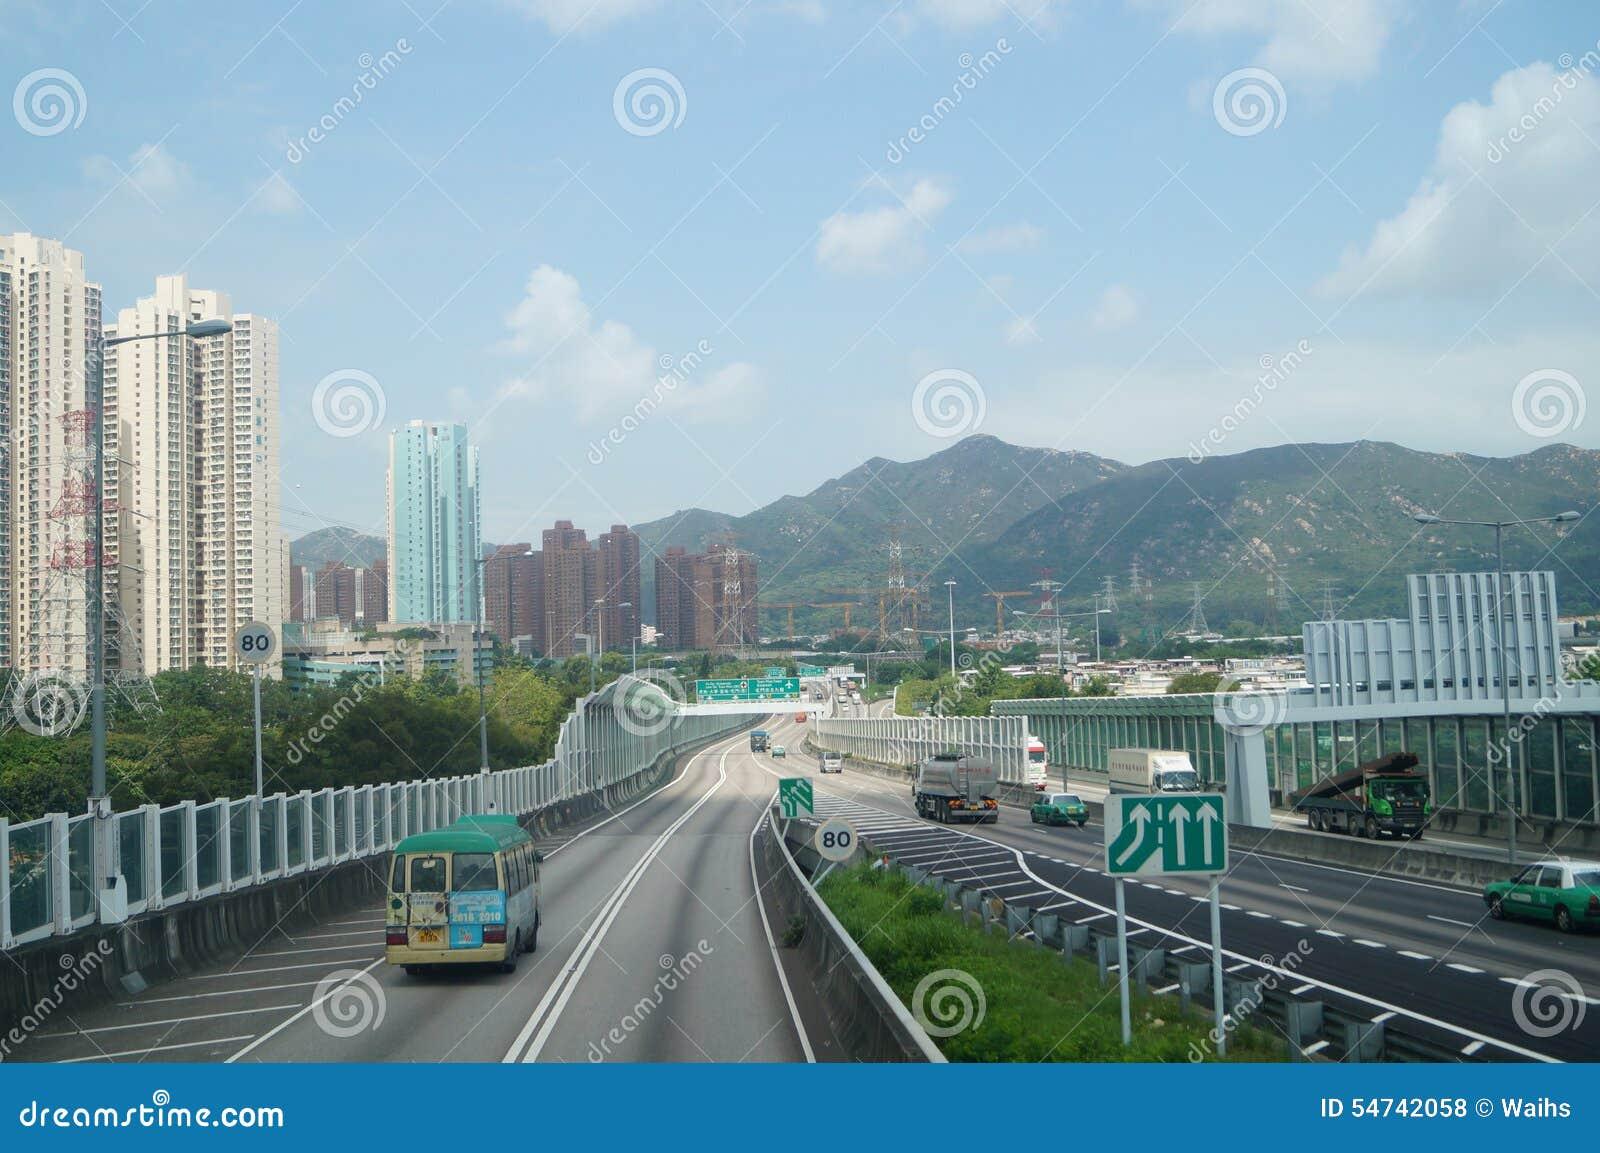 Hongkong, Chiny: Drogowy ruch drogowy